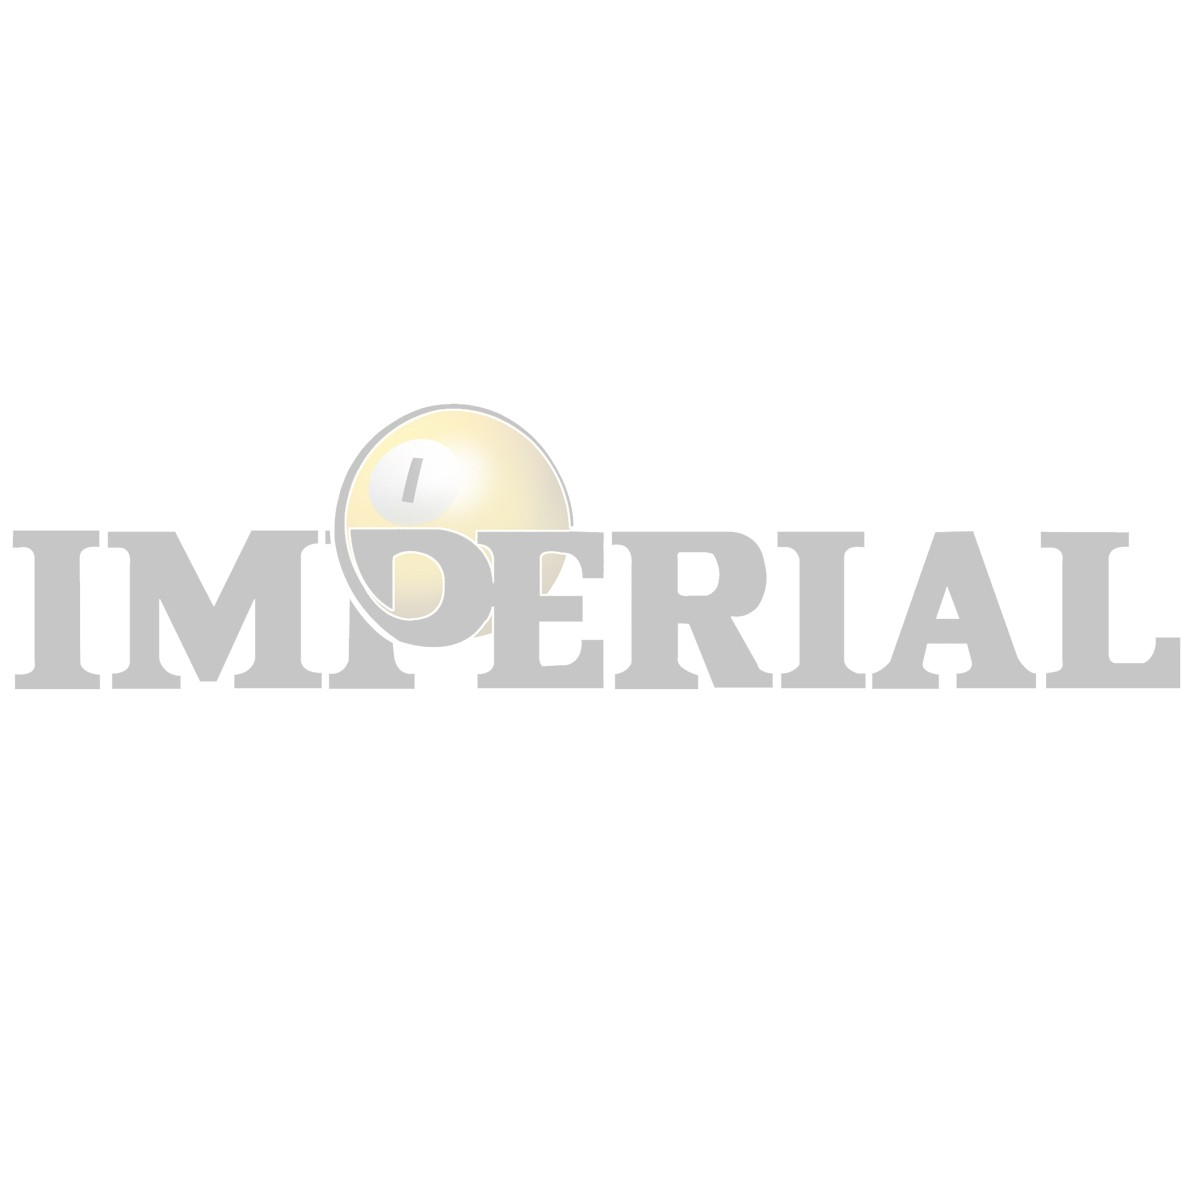 Pittsburgh Penguins® 8-foot Billiard Cloth